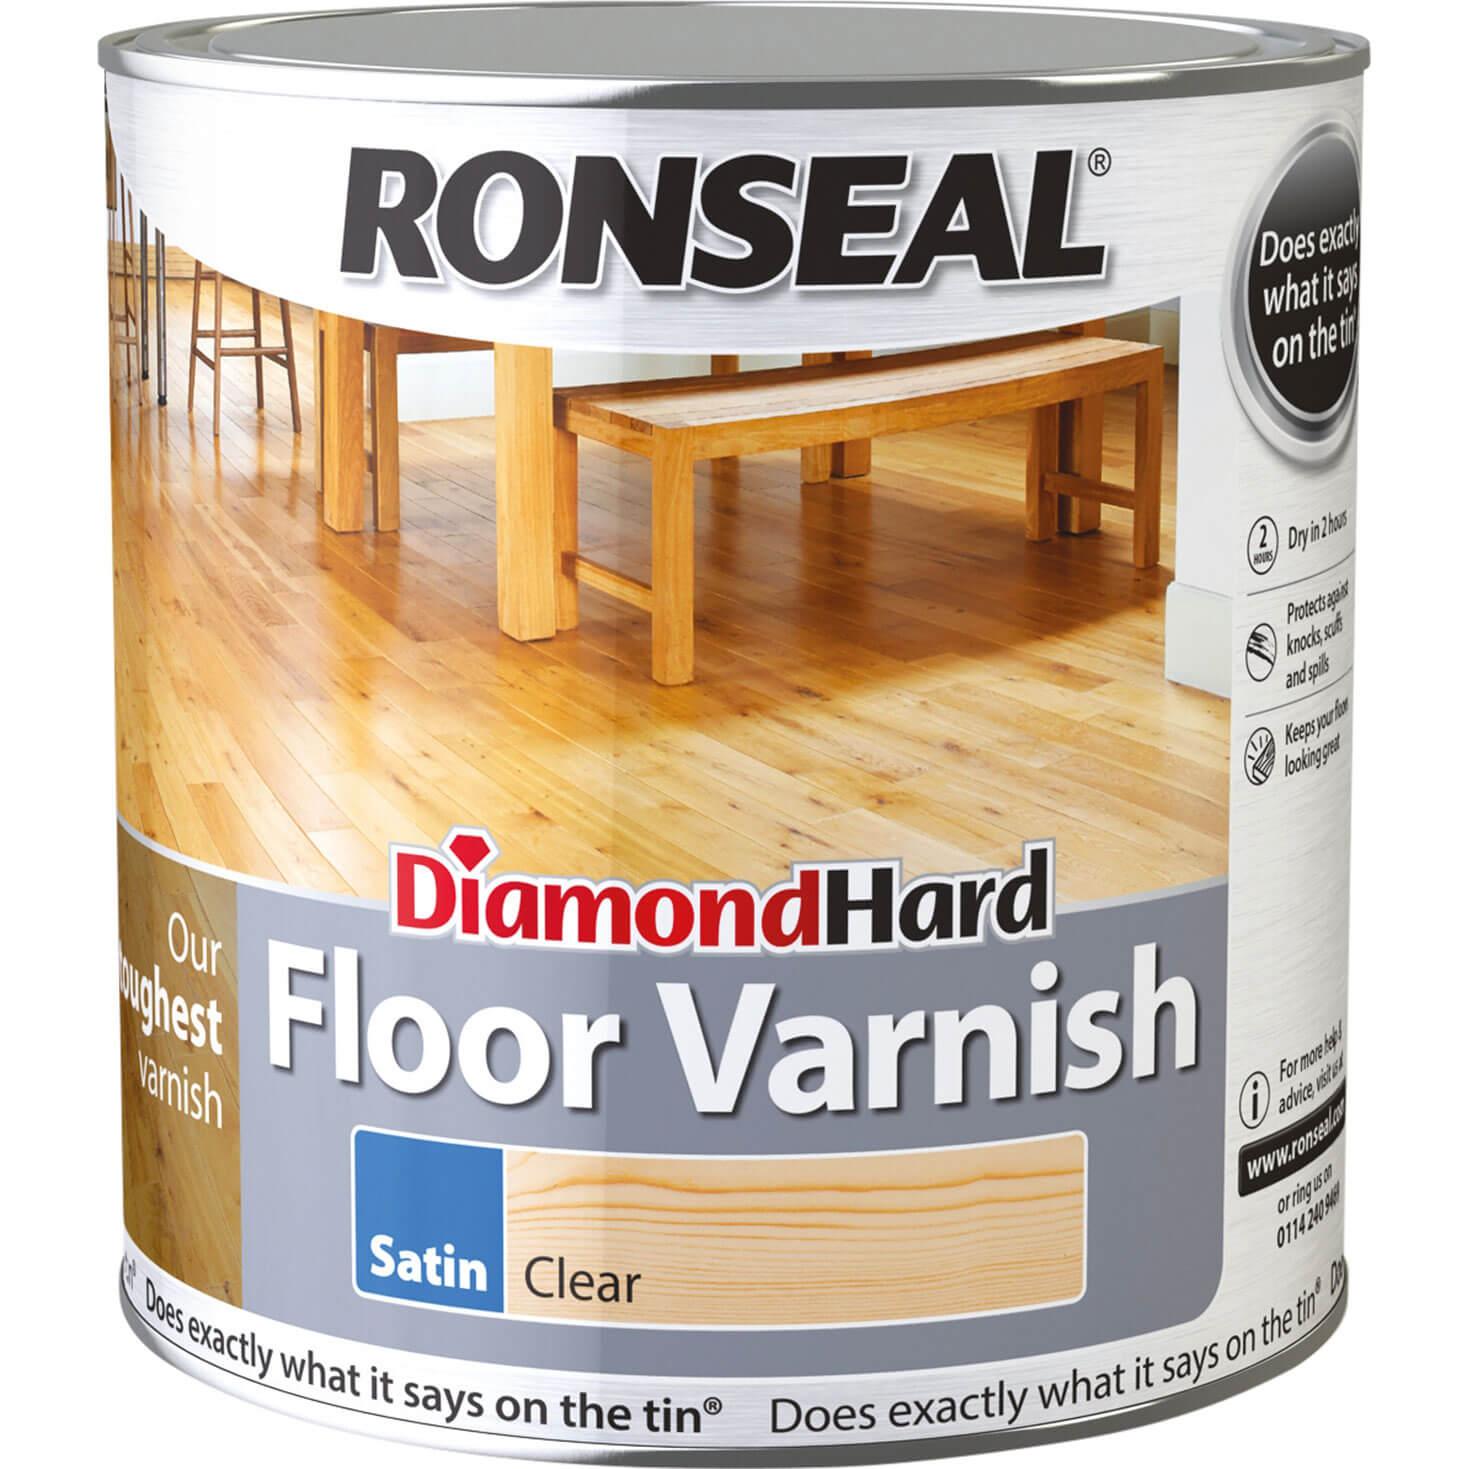 Image of Ronseal Diamond Hard Floor Varnish 2.5l Gloss